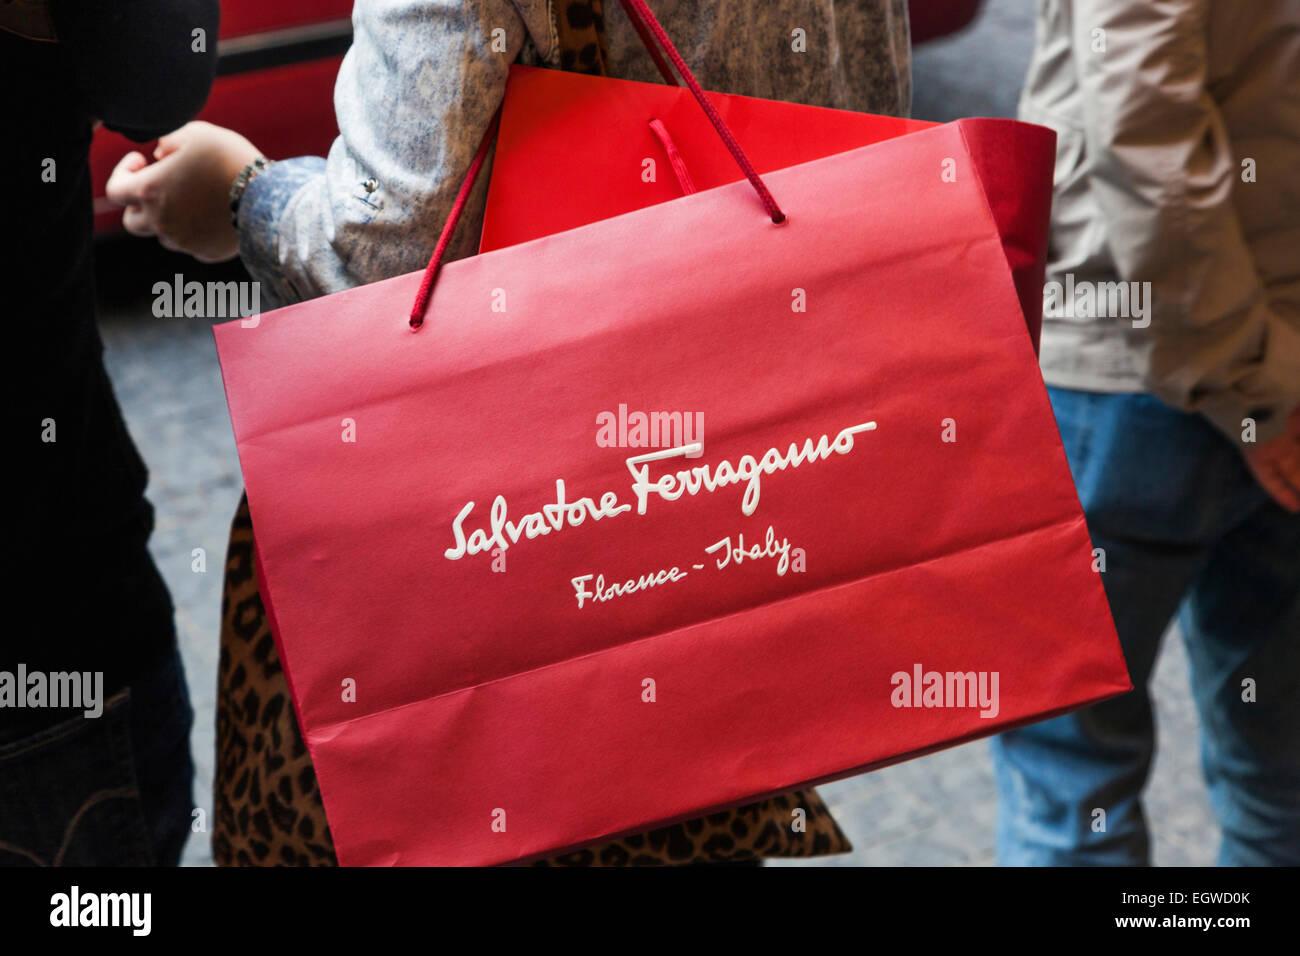 China, Hong Kong, Central, Shopper Carrying Salvatore Ferragamo Bag - Stock Image